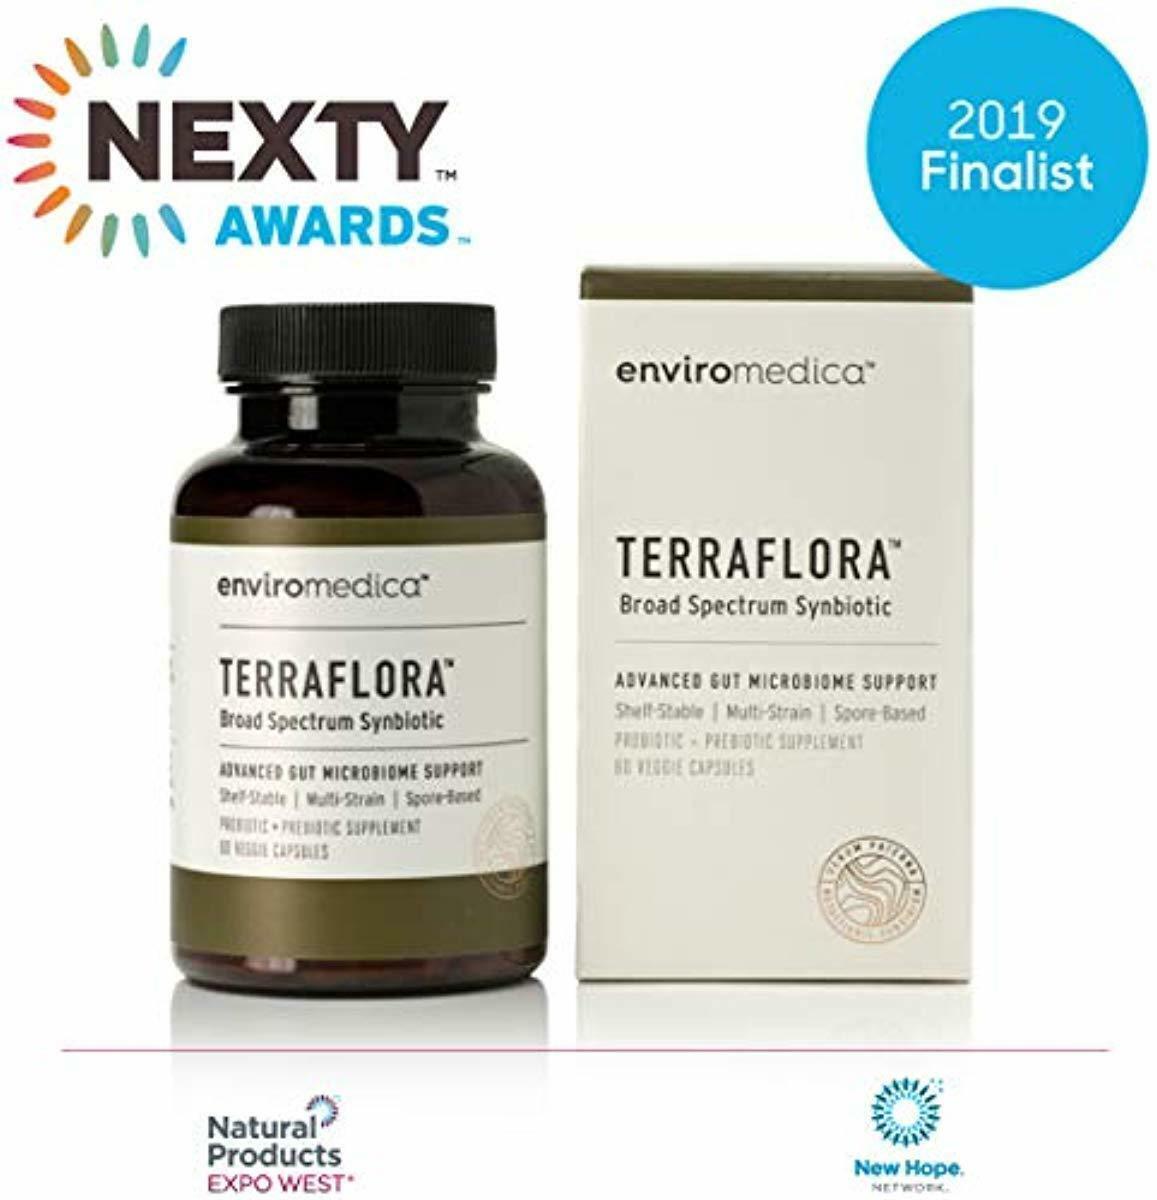 Enviromedica Terraflora SBO Probiotic + Prebiotic Supplement